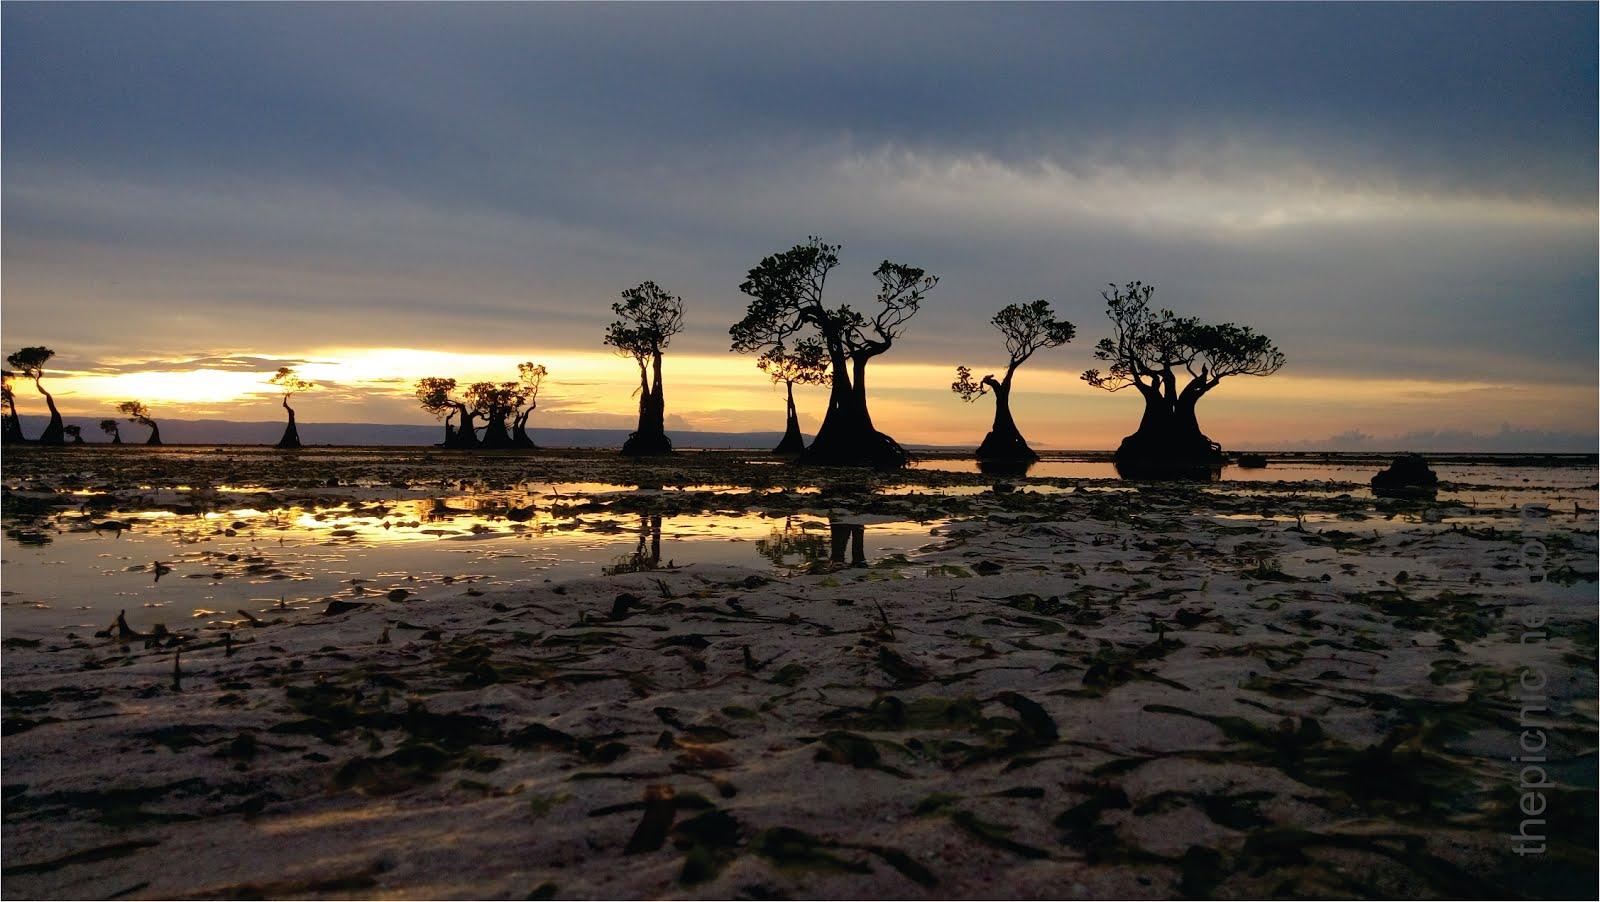 Menikmati Fenomena Sunset di Pantai Walakiri Sumba